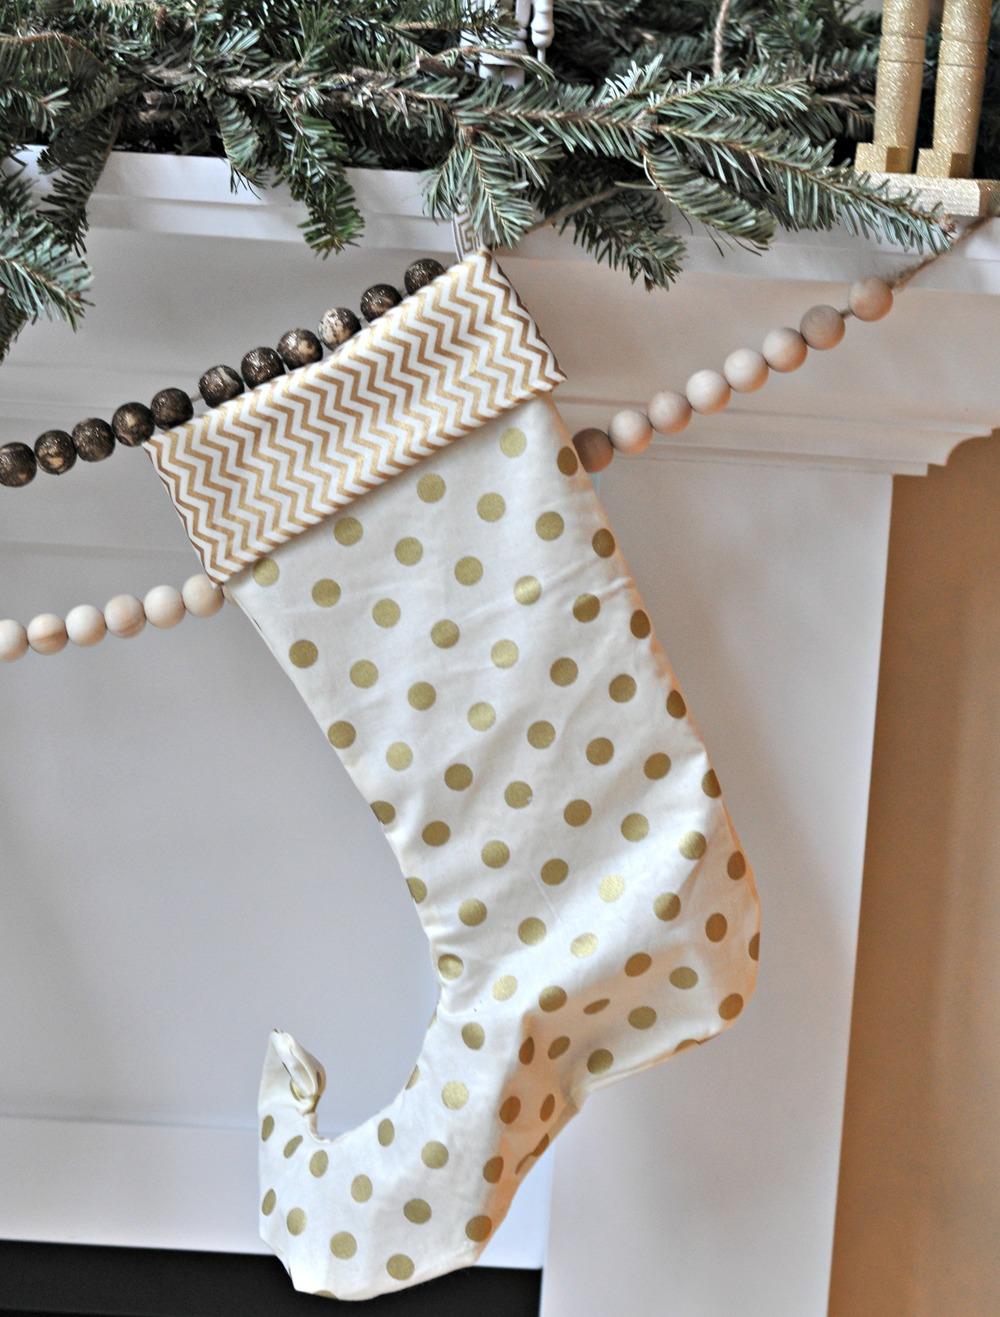 Holiday mantel elf stocking.jpg